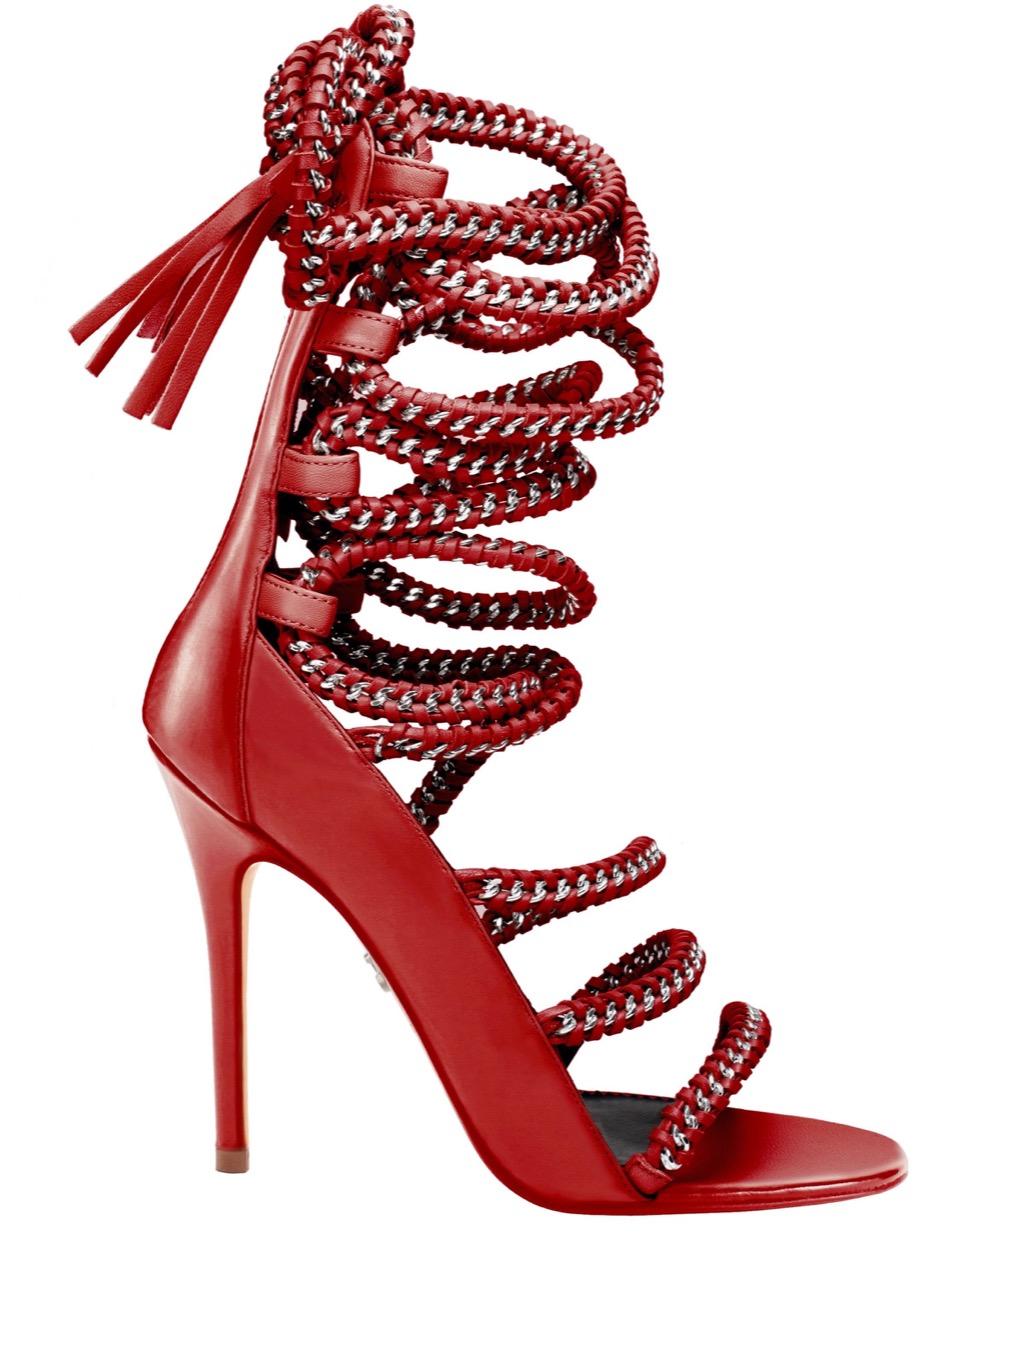 monika chiang tall heel